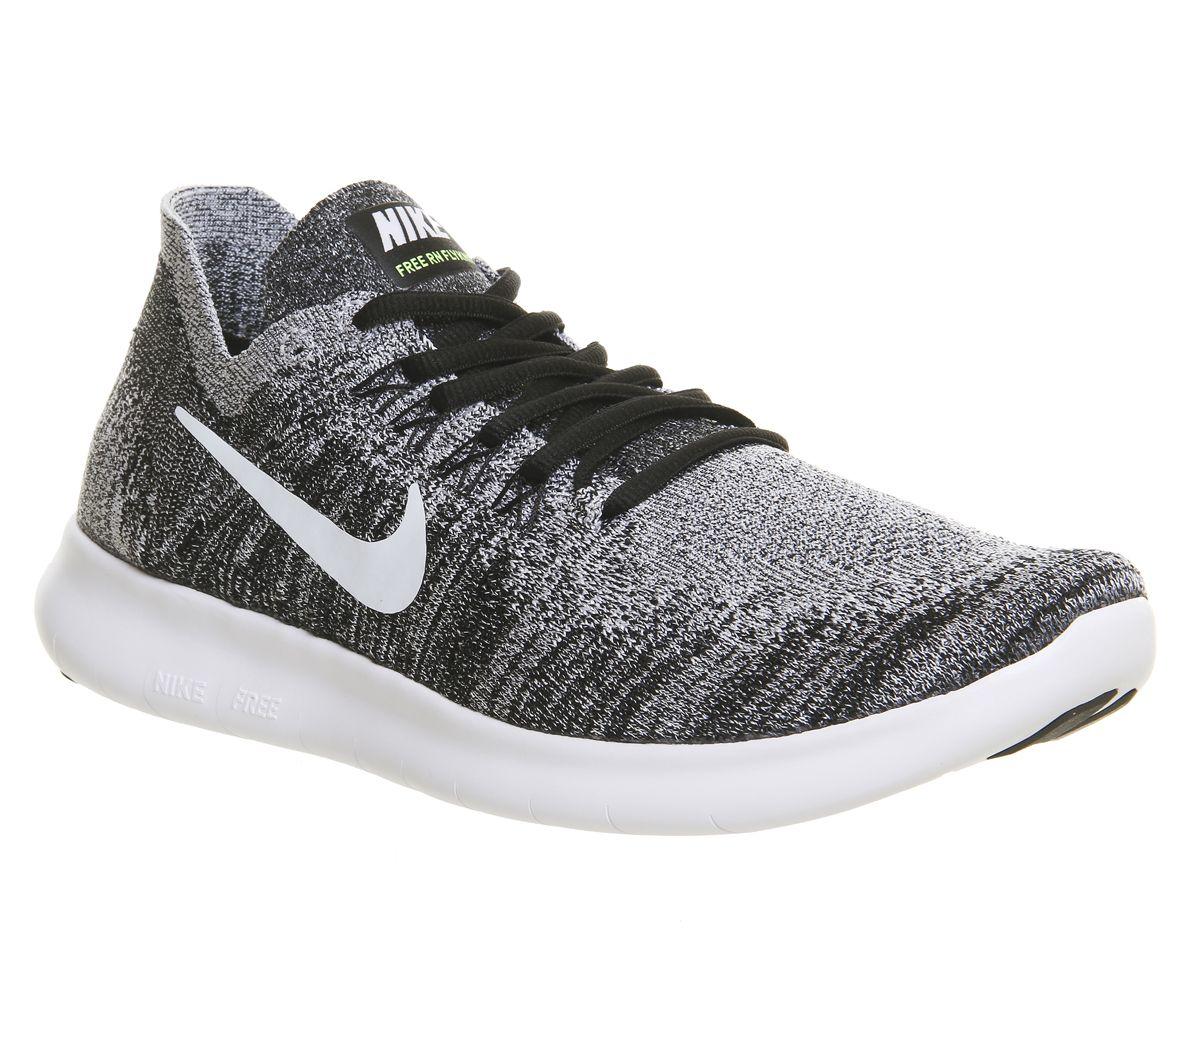 54de2d4e56238 Nike Free Run 2 Fk Grey Black Volt M - His trainers